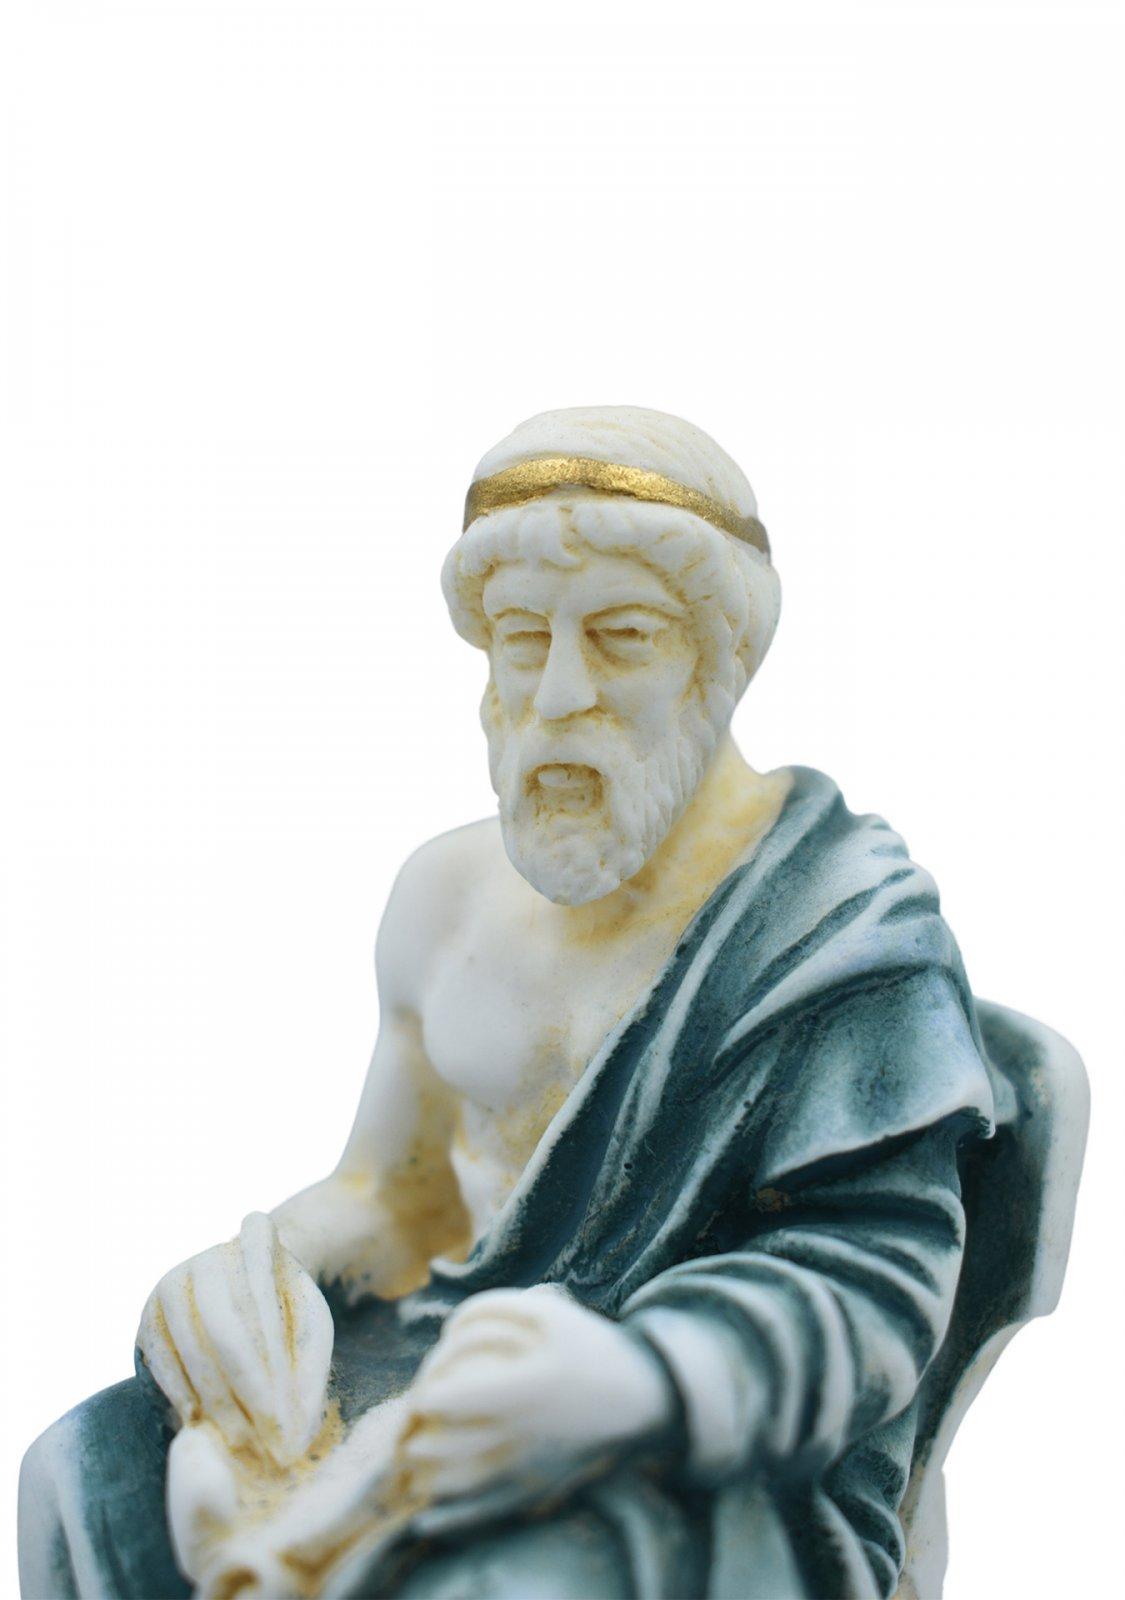 Plato greek alabaster statue with color